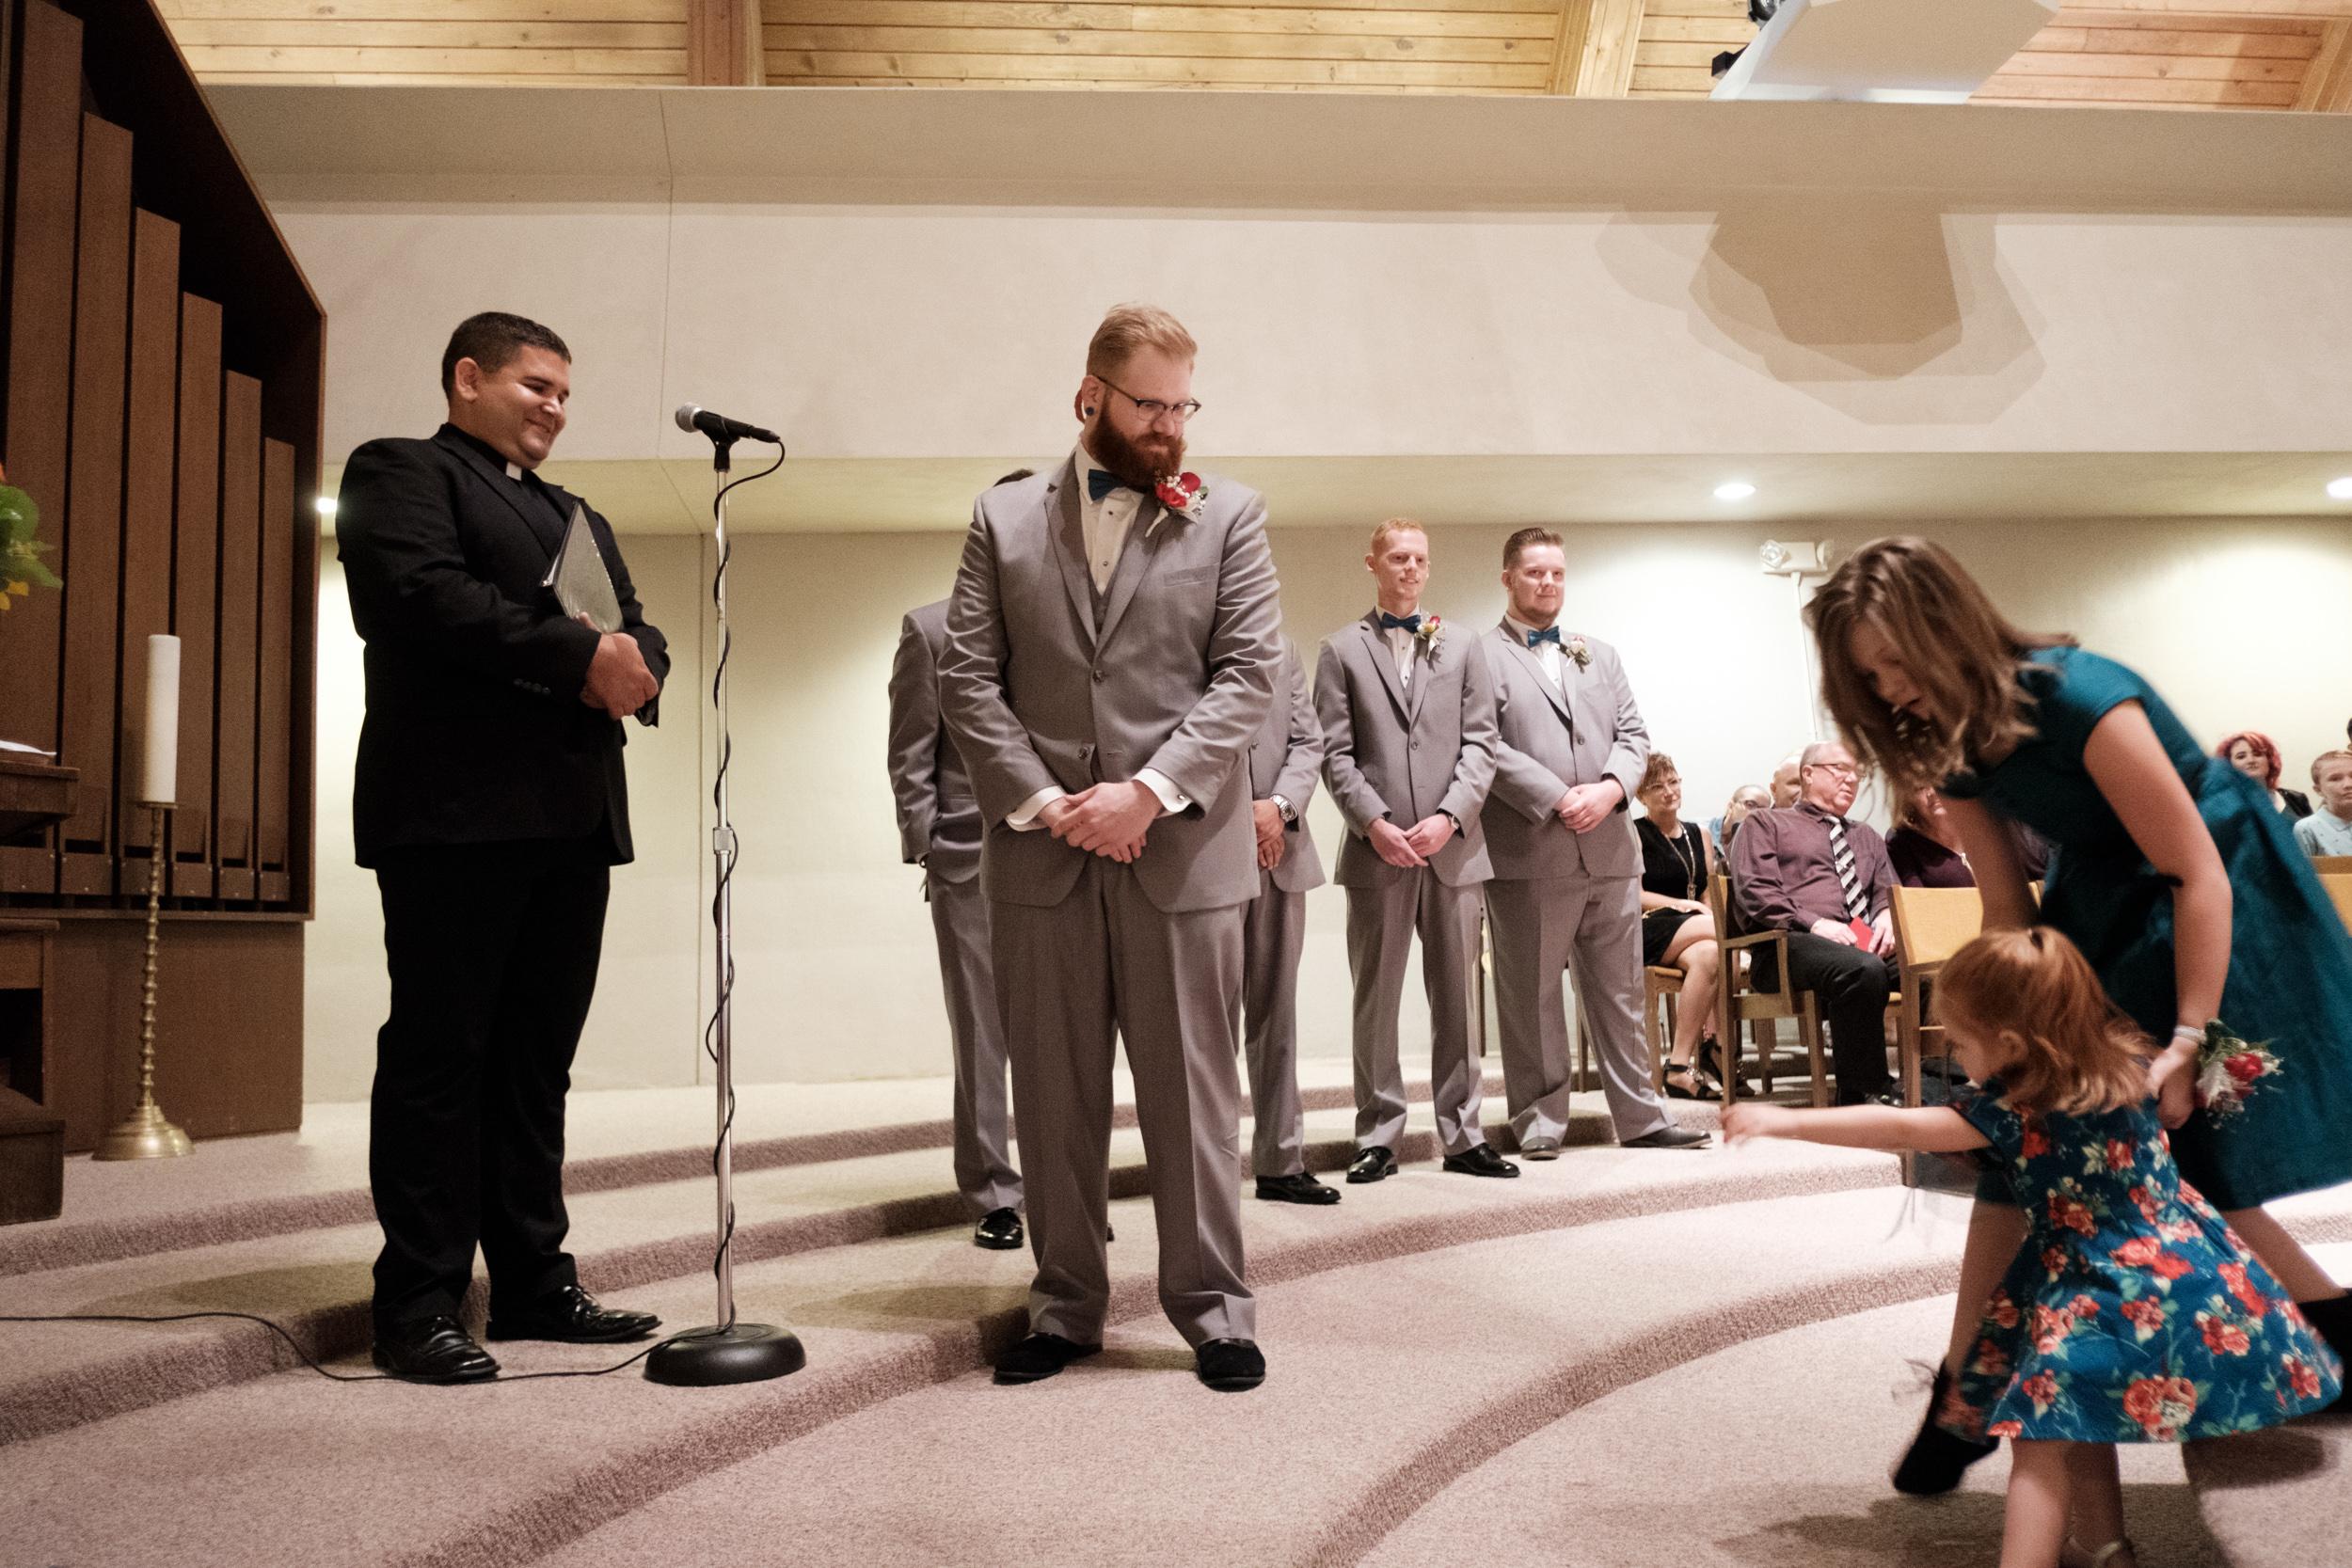 Christian & Sarah wedding photography by Brian milo-152.jpg